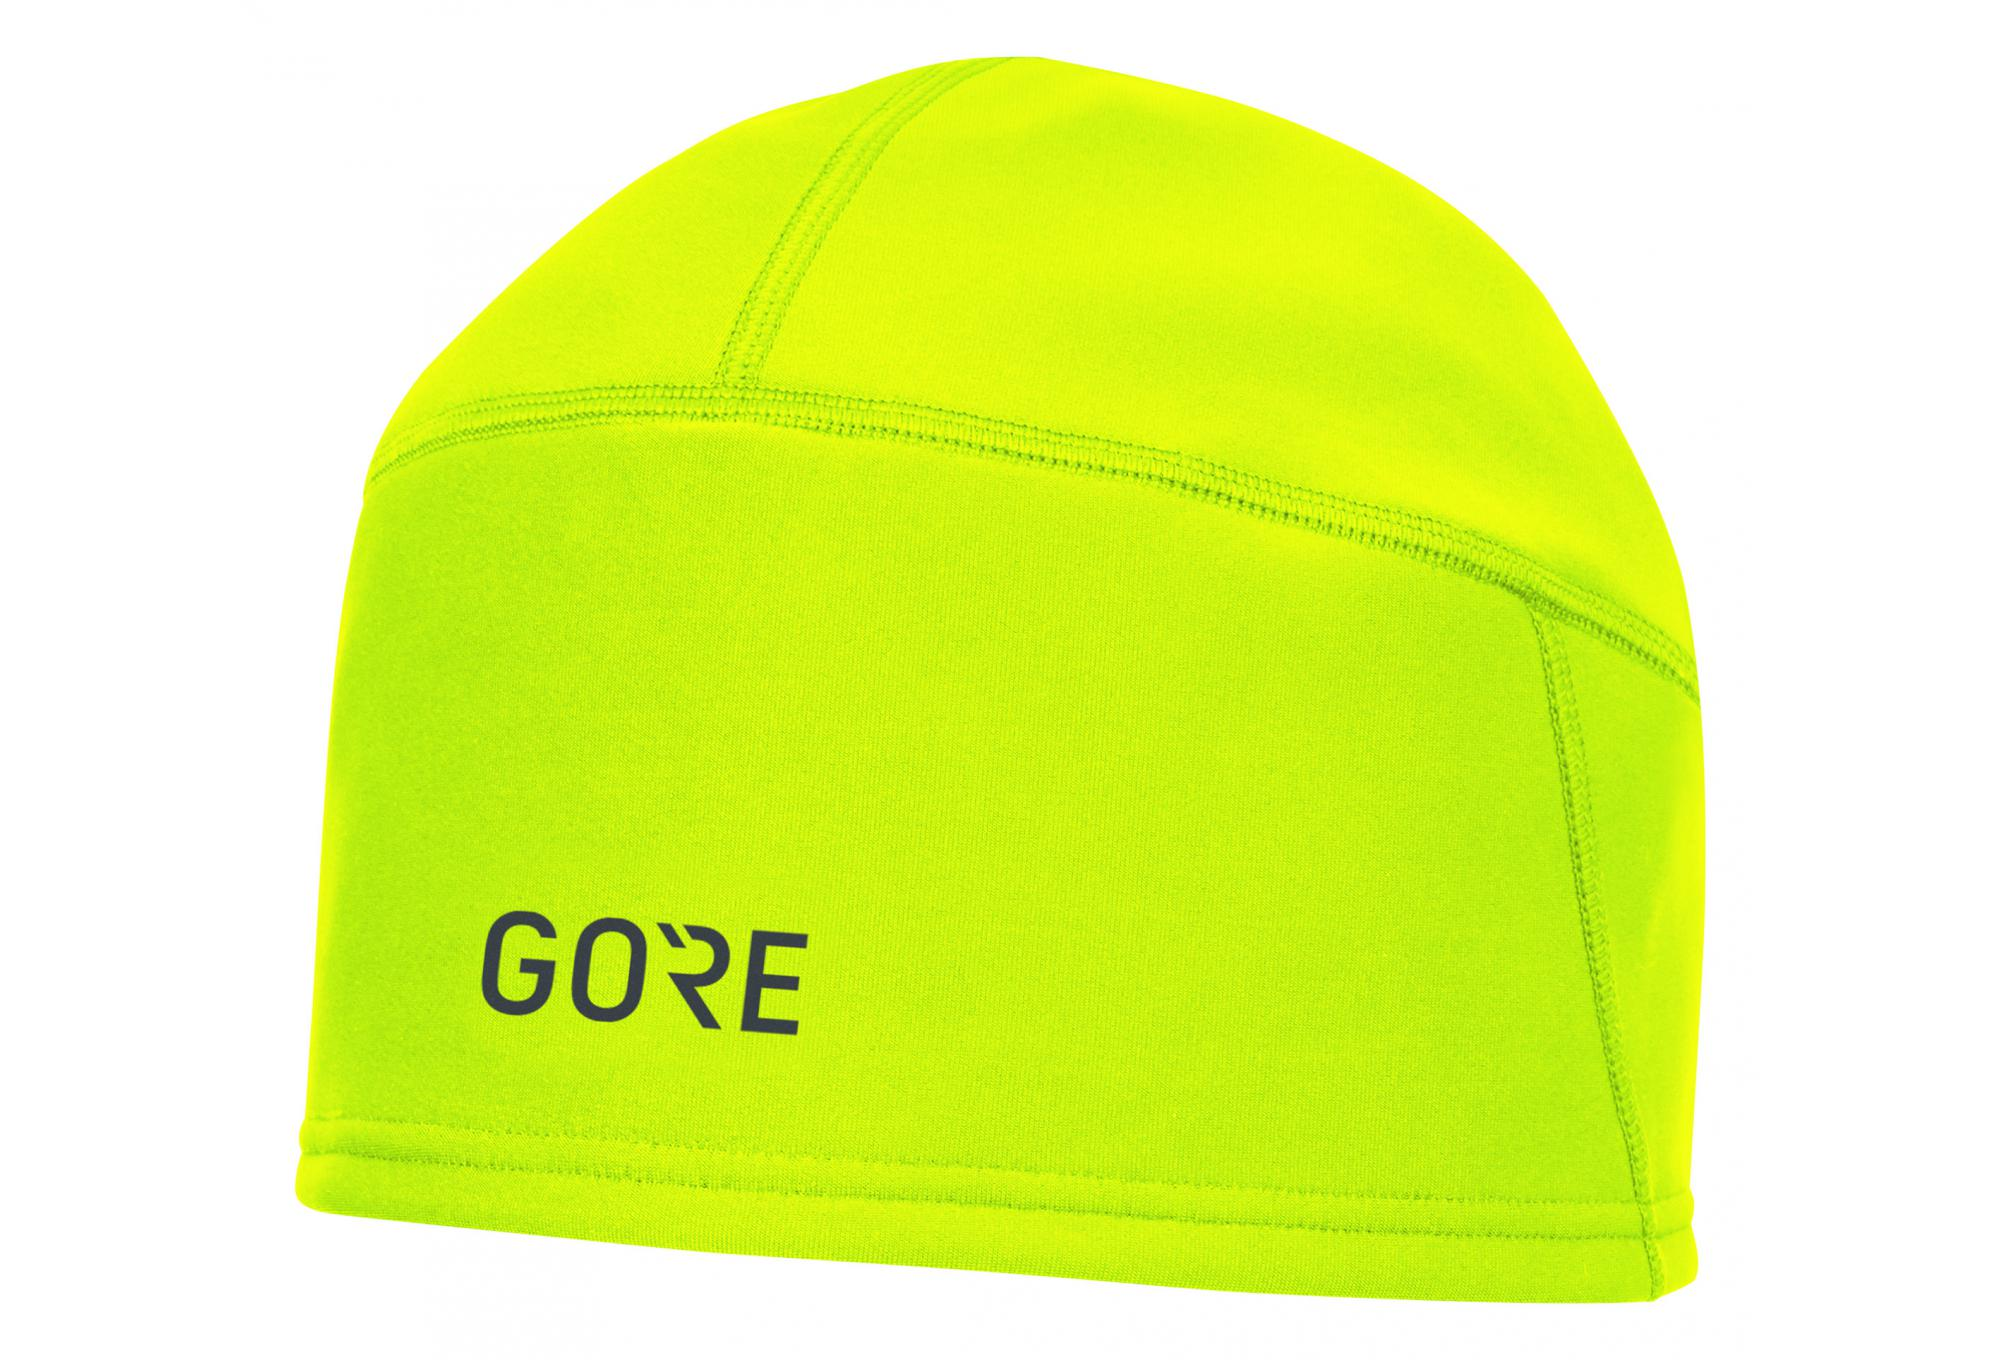 49c0bd4420d GORE M GORE WINDSTOPPER Beanie Yellow